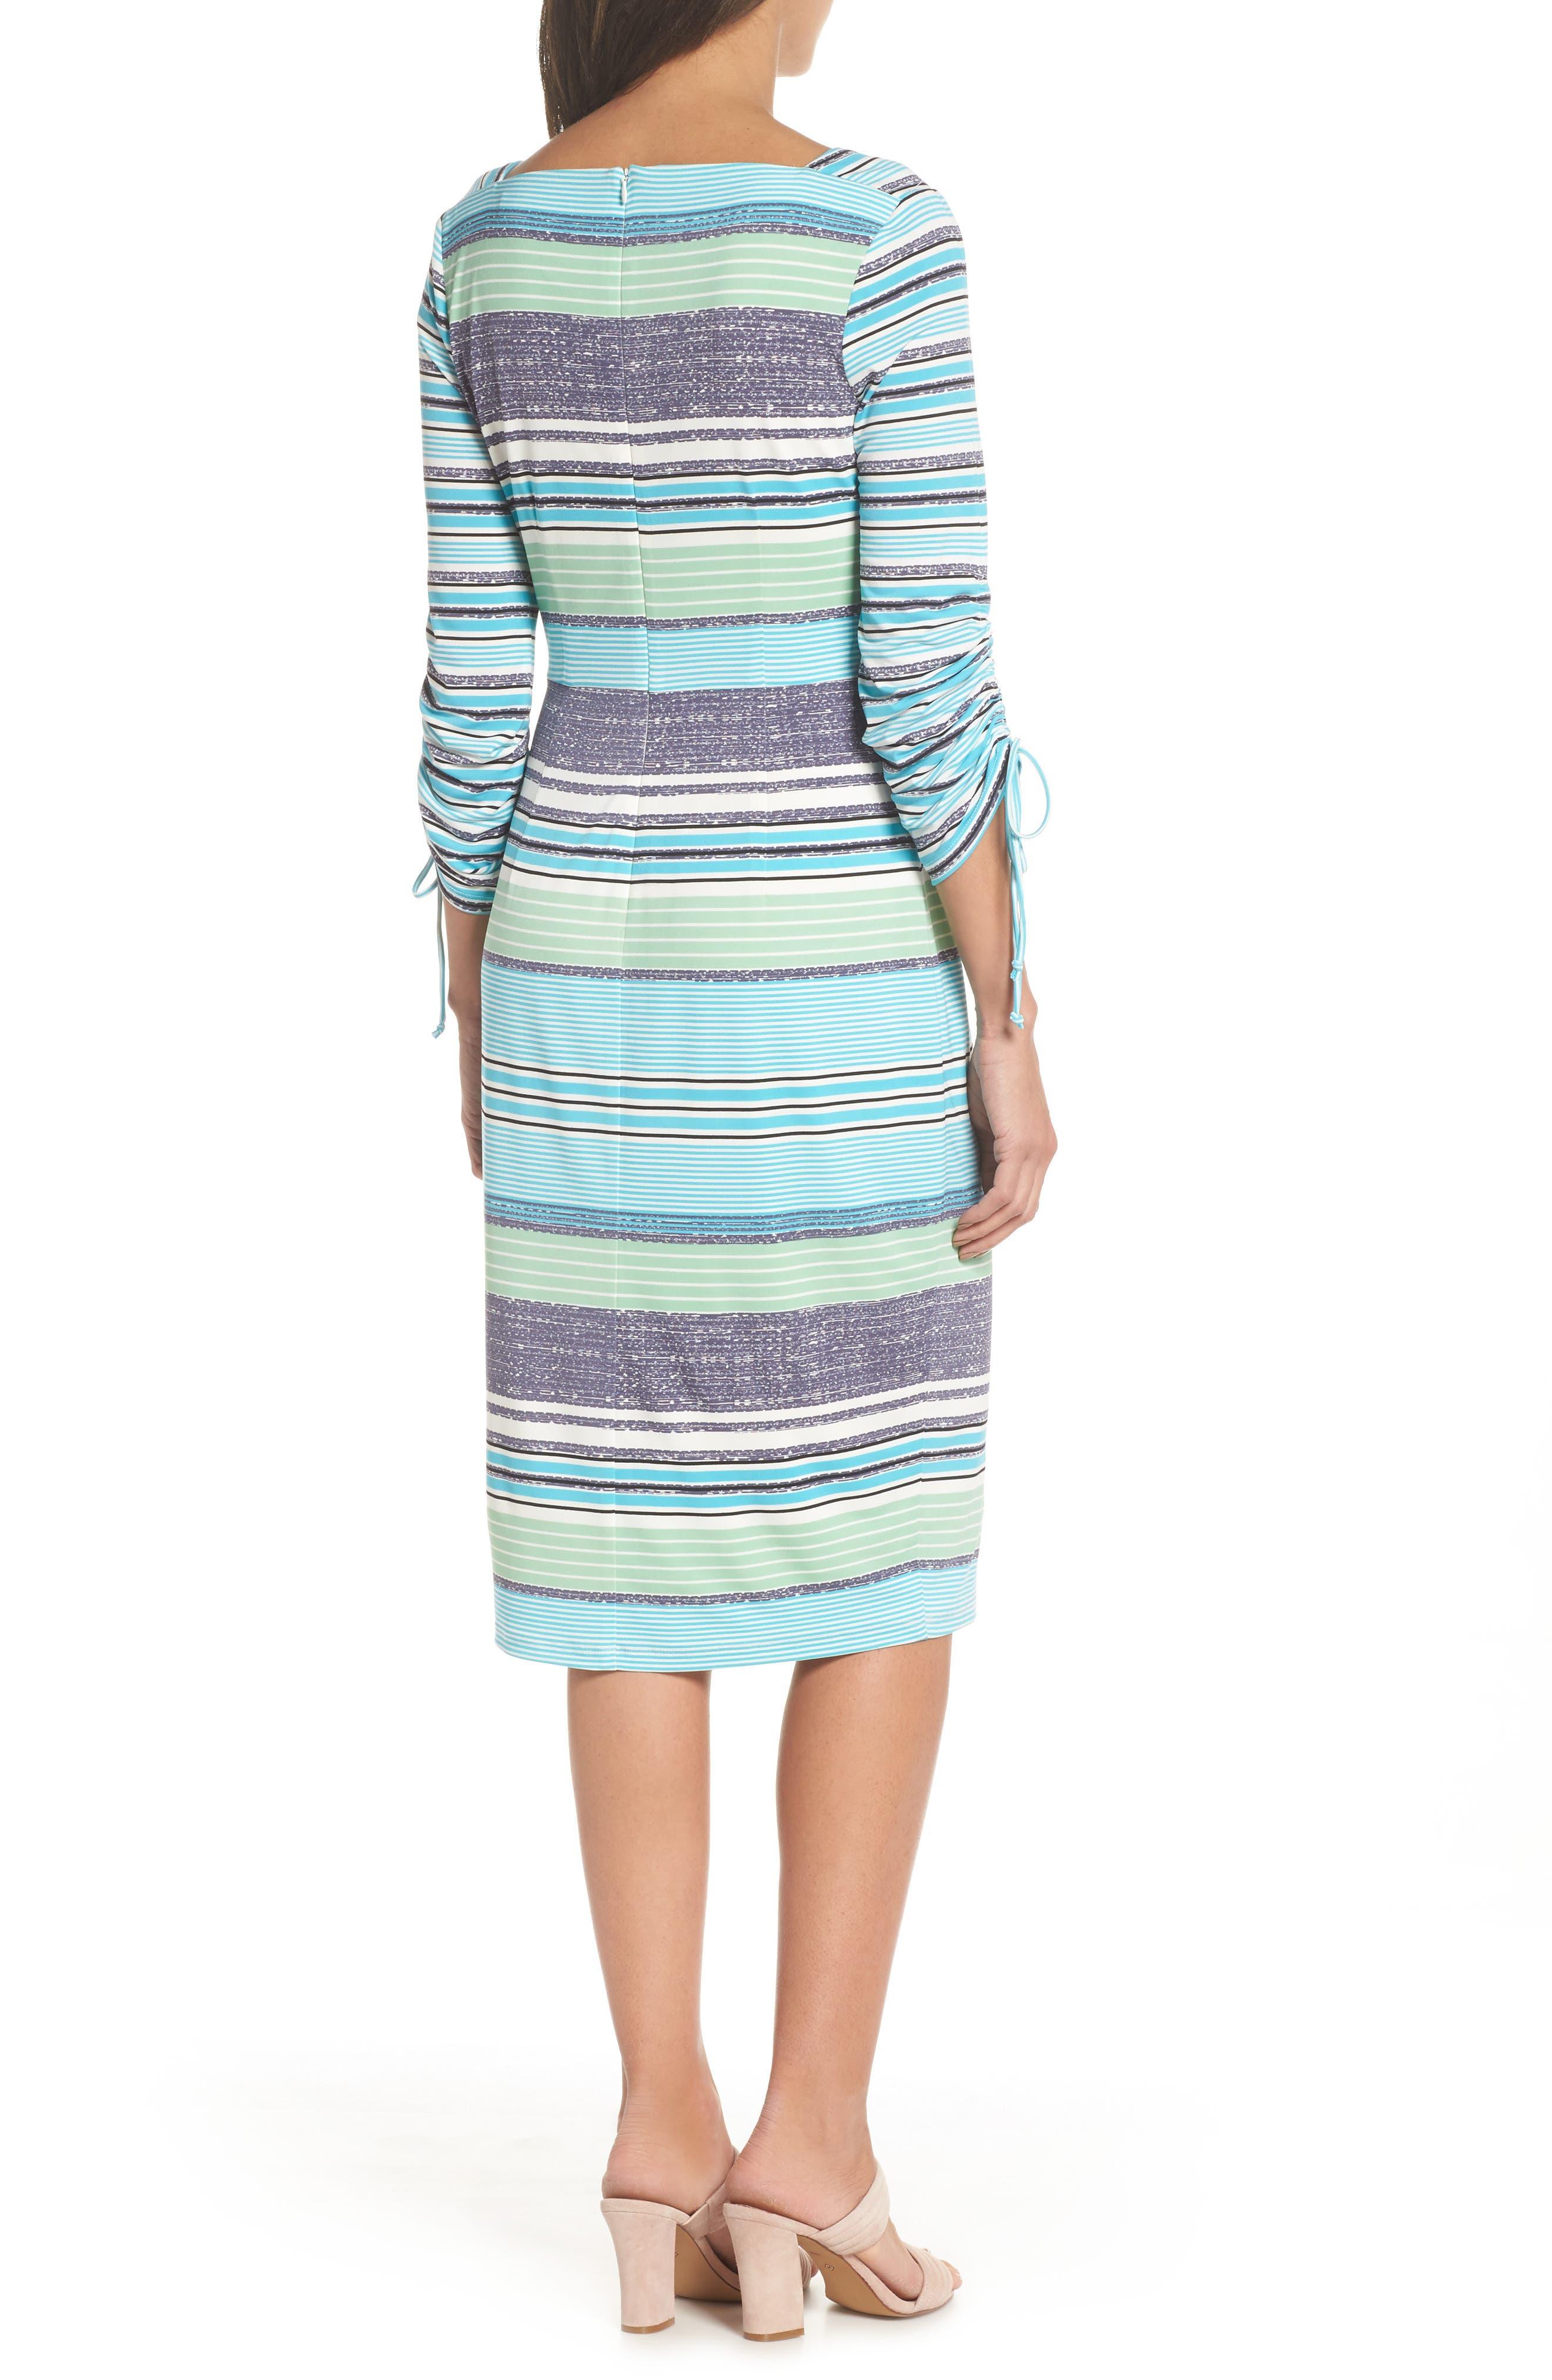 Ruched Sleeve Sheath Dress,                             Alternate thumbnail 2, color,                             White/ Aqua